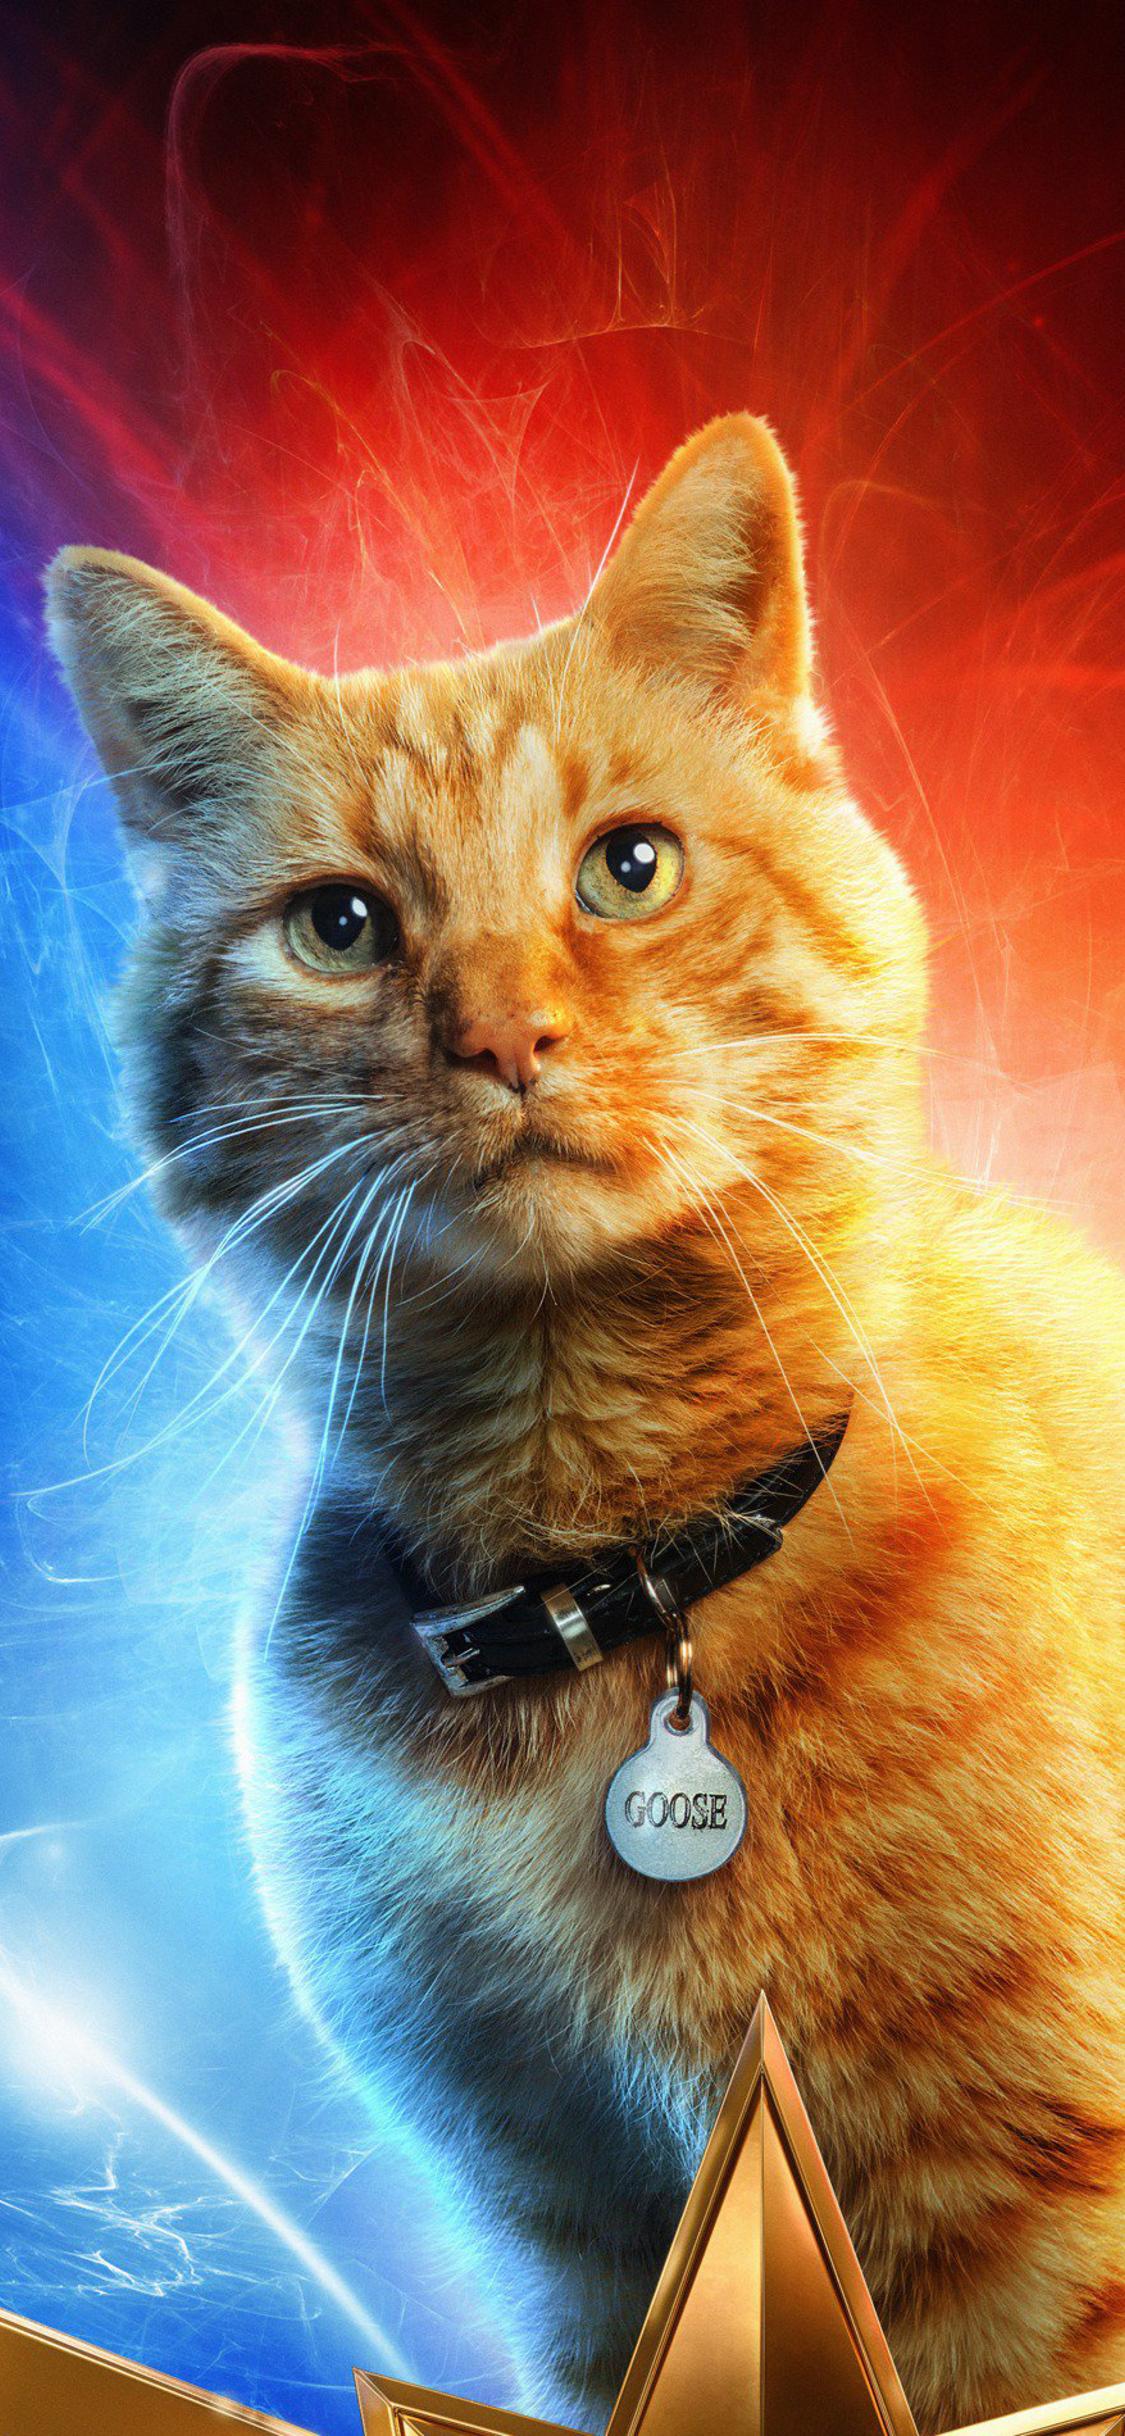 goose-the-cat-in-captain-marvel-p8.jpg